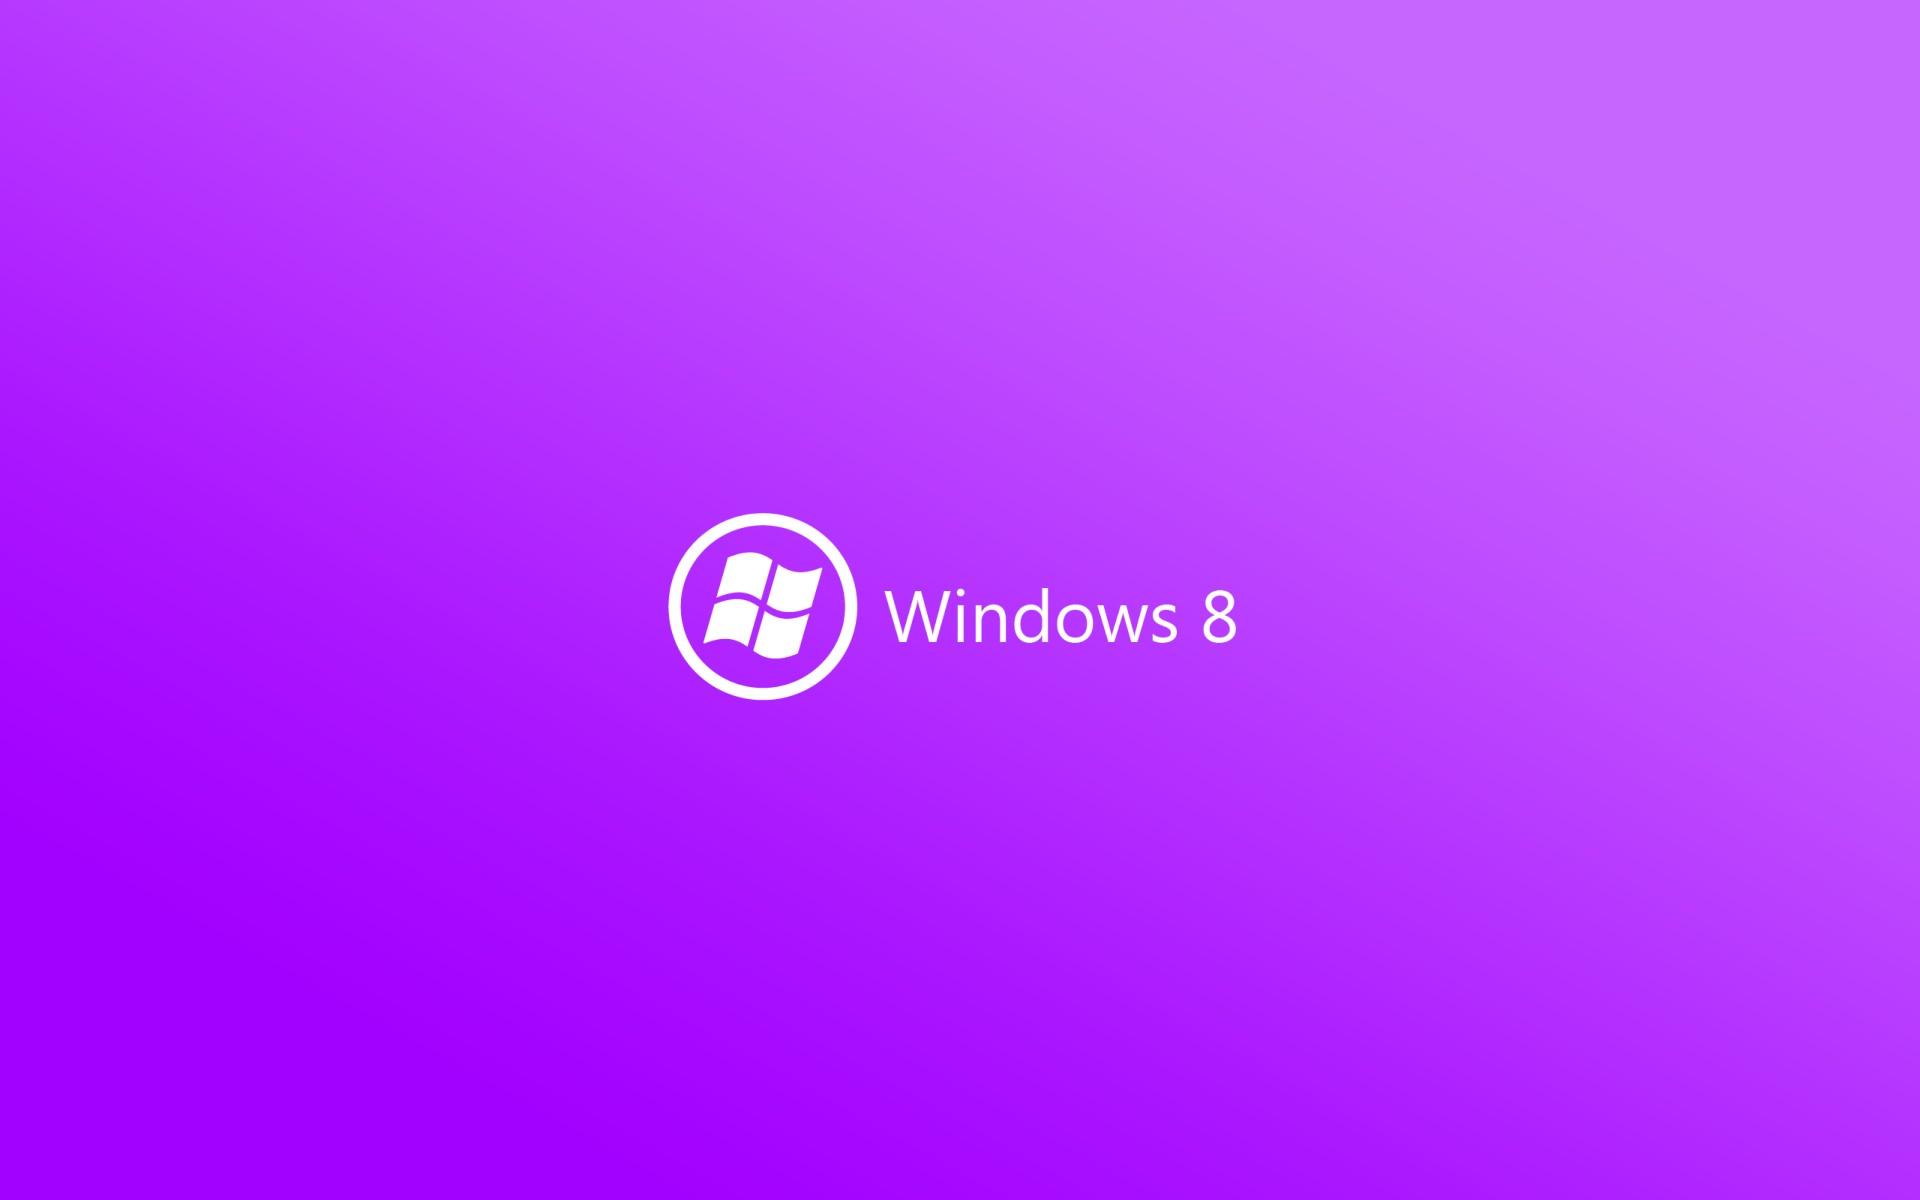 windows 8 wallpaper 48608